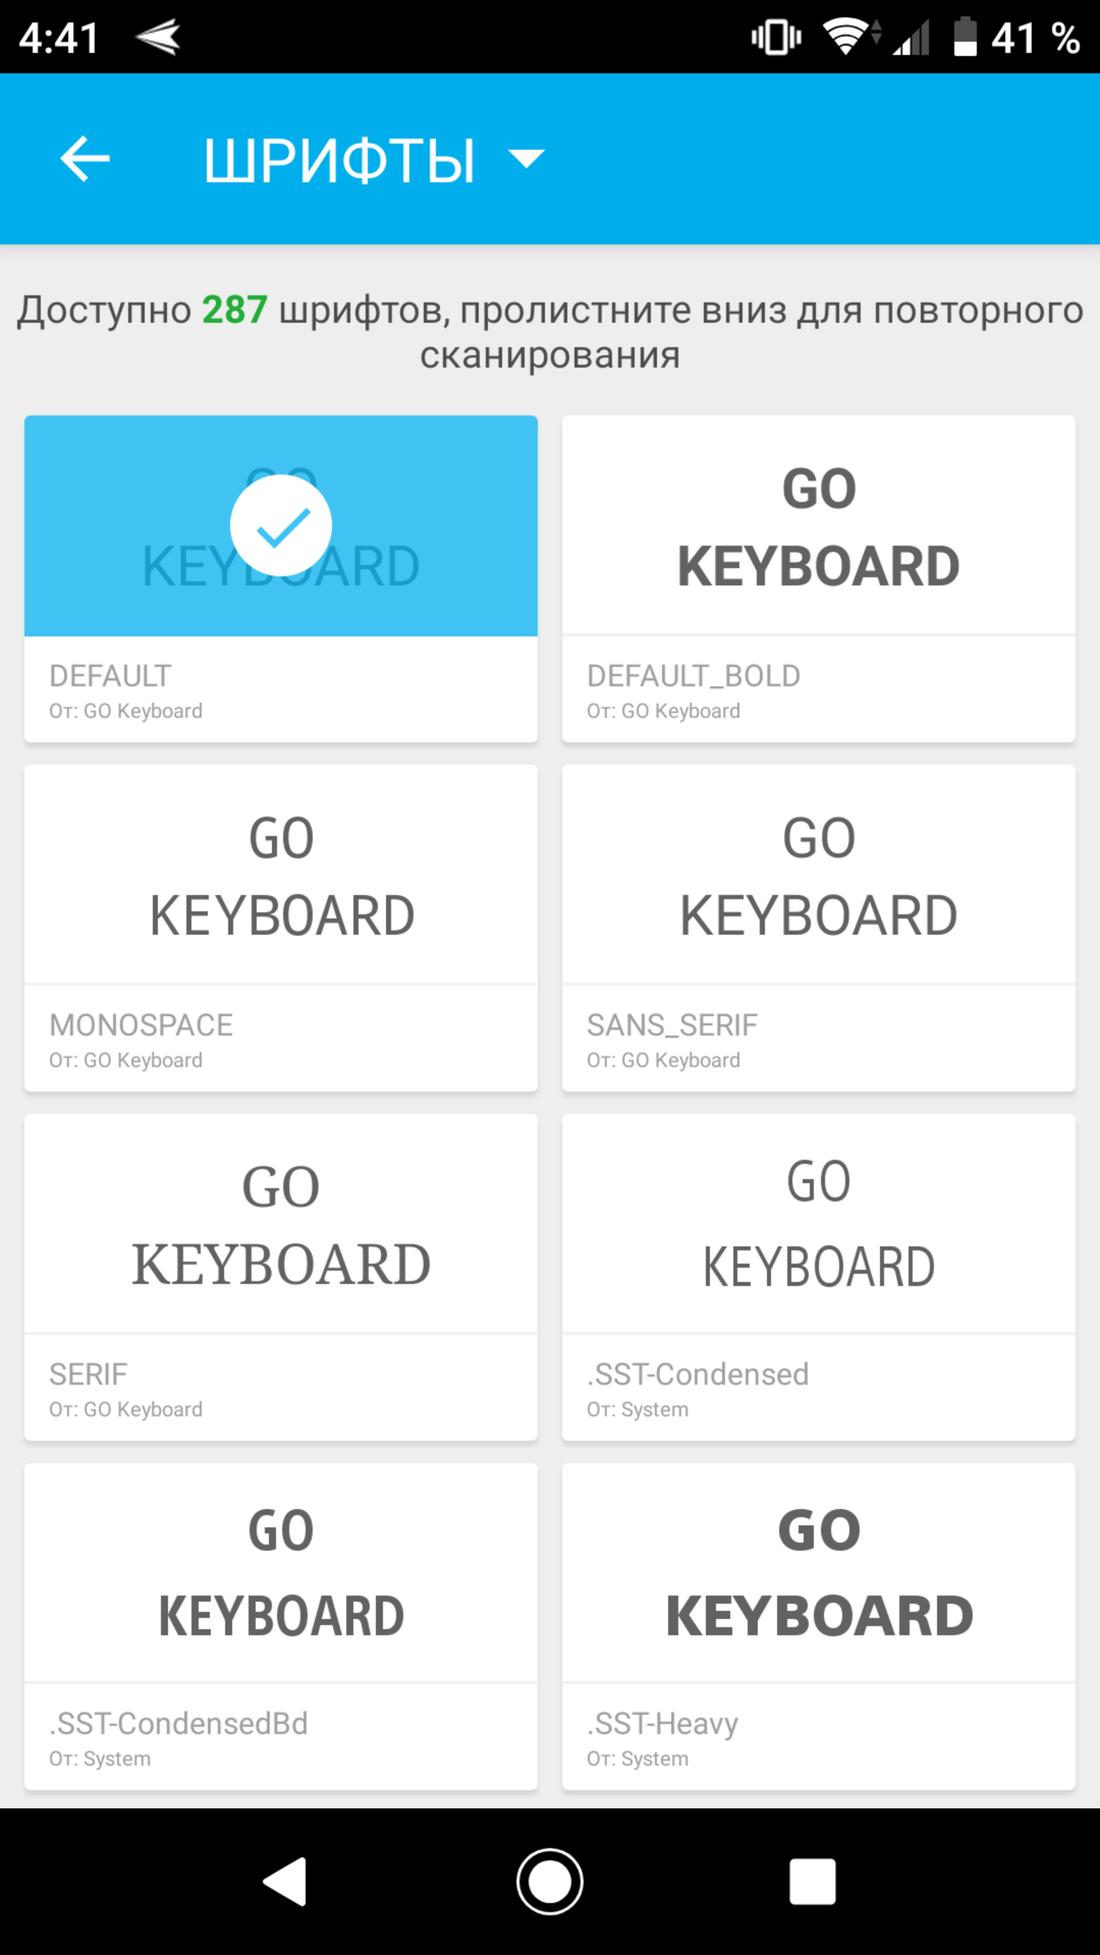 Скриншот #4 из программы GO Keyboard